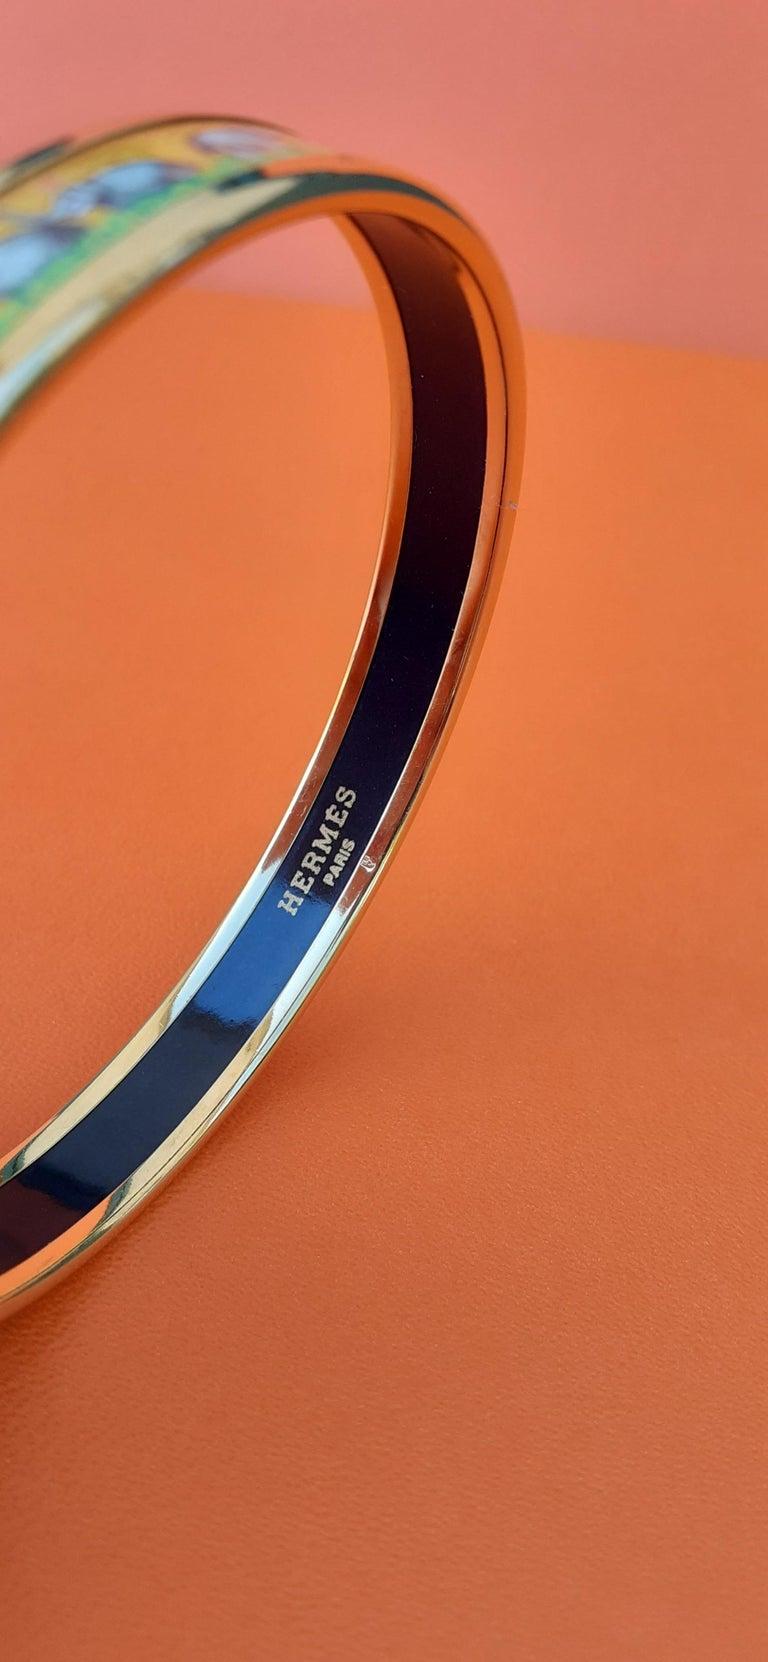 Hermès Enamel Printed Bracelet Elephants Grazing Yellow Ghw Narrow Size 65 For Sale 4